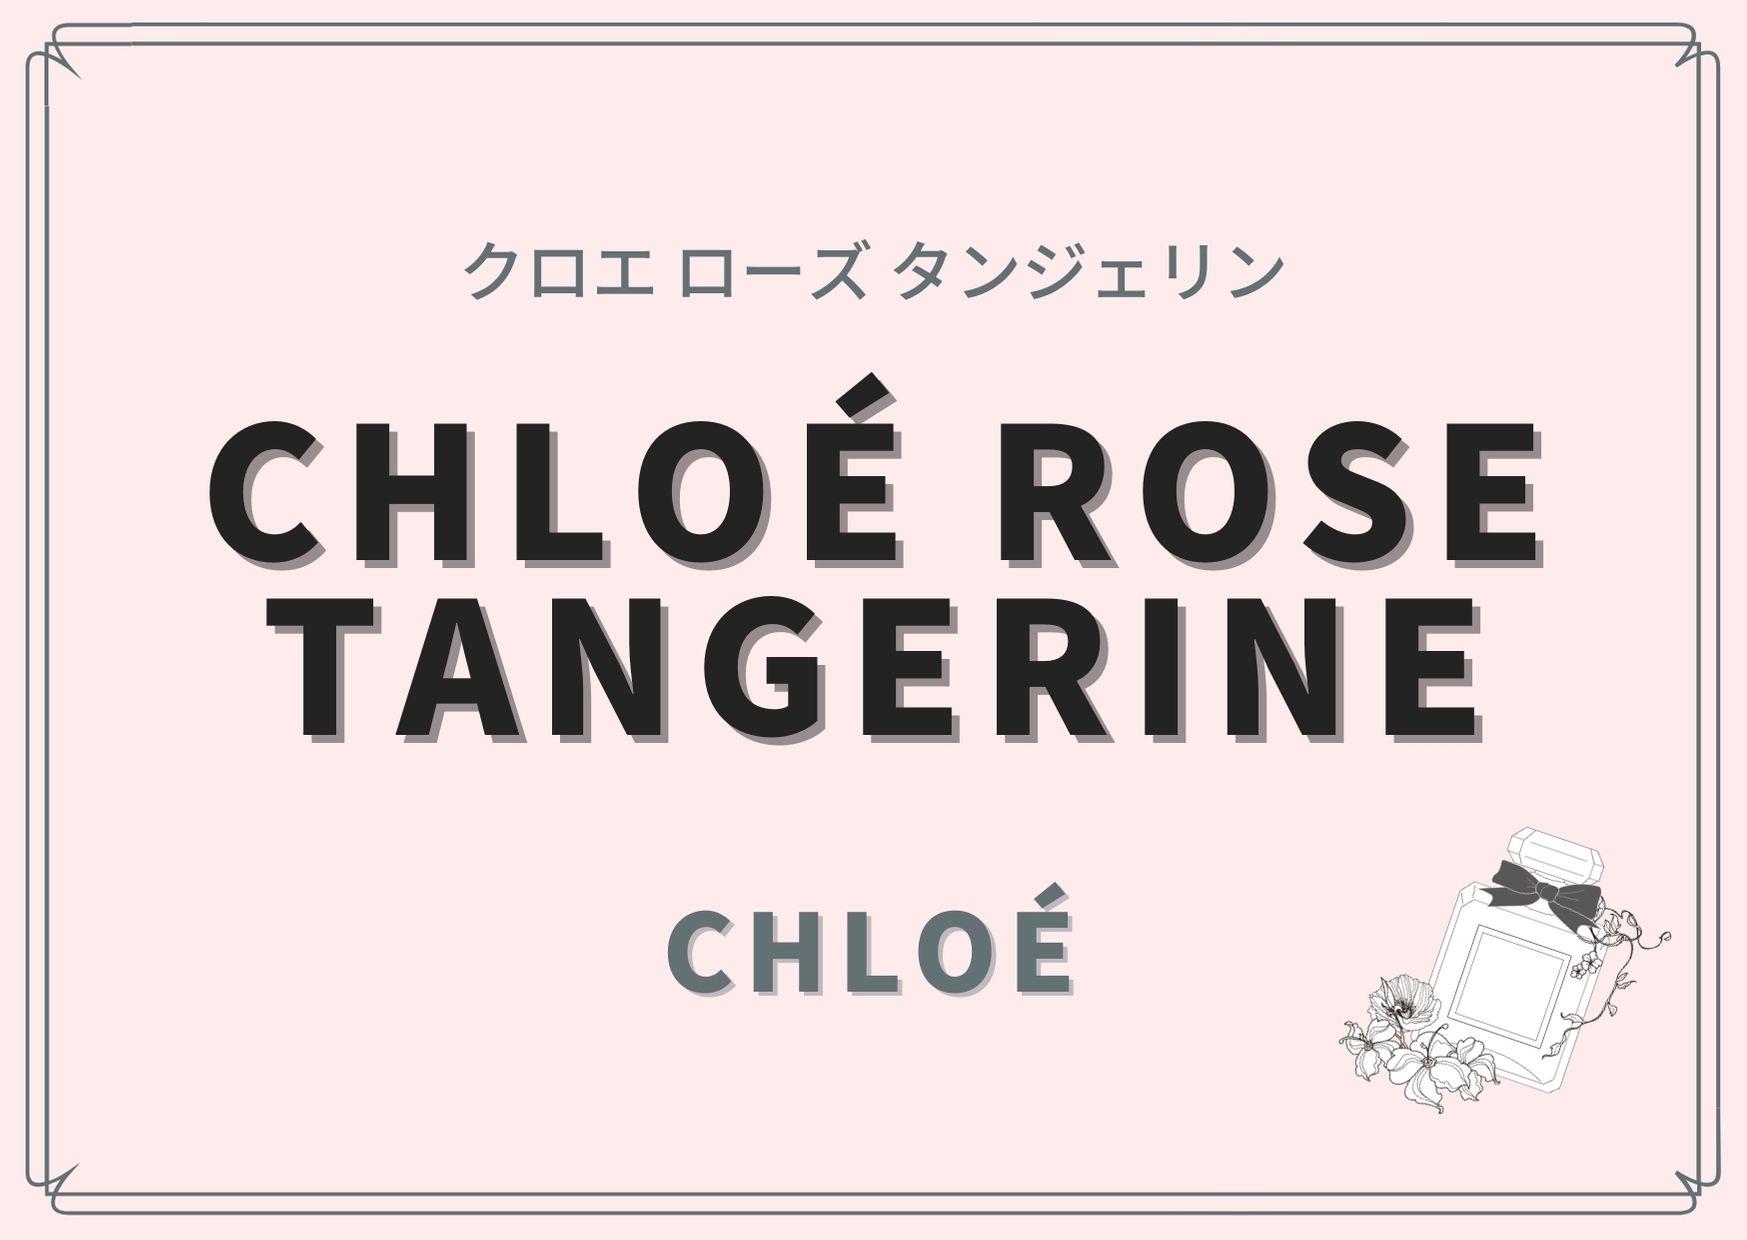 Chloé Rose tangerine(クロエ ローズ タンジェリン)/Chloé(クロエ)